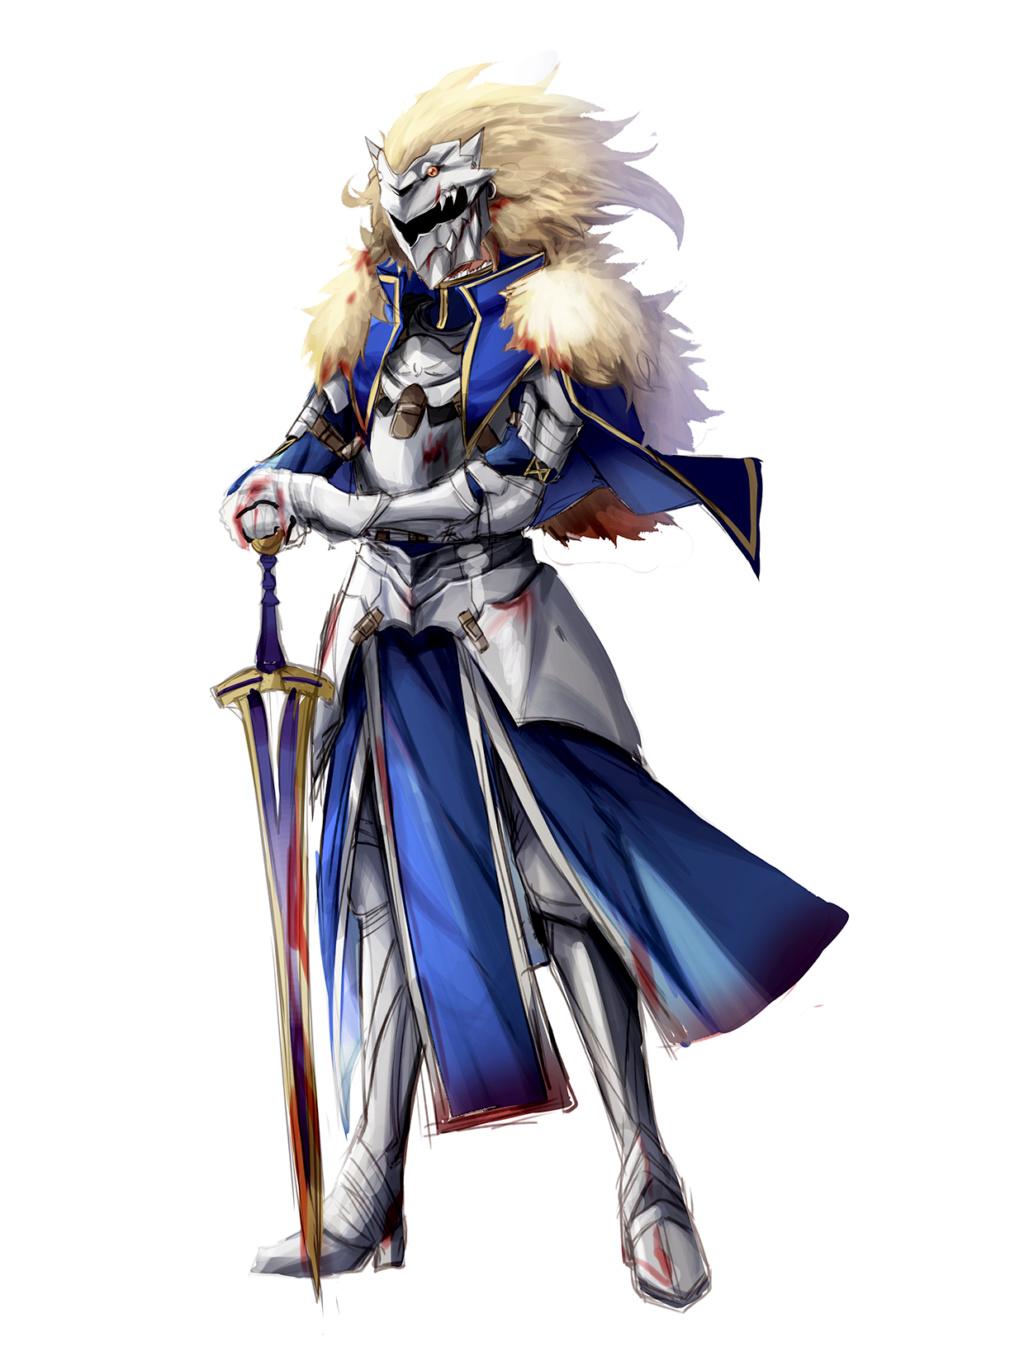 Arthur's White Knight Armor Tumblr11